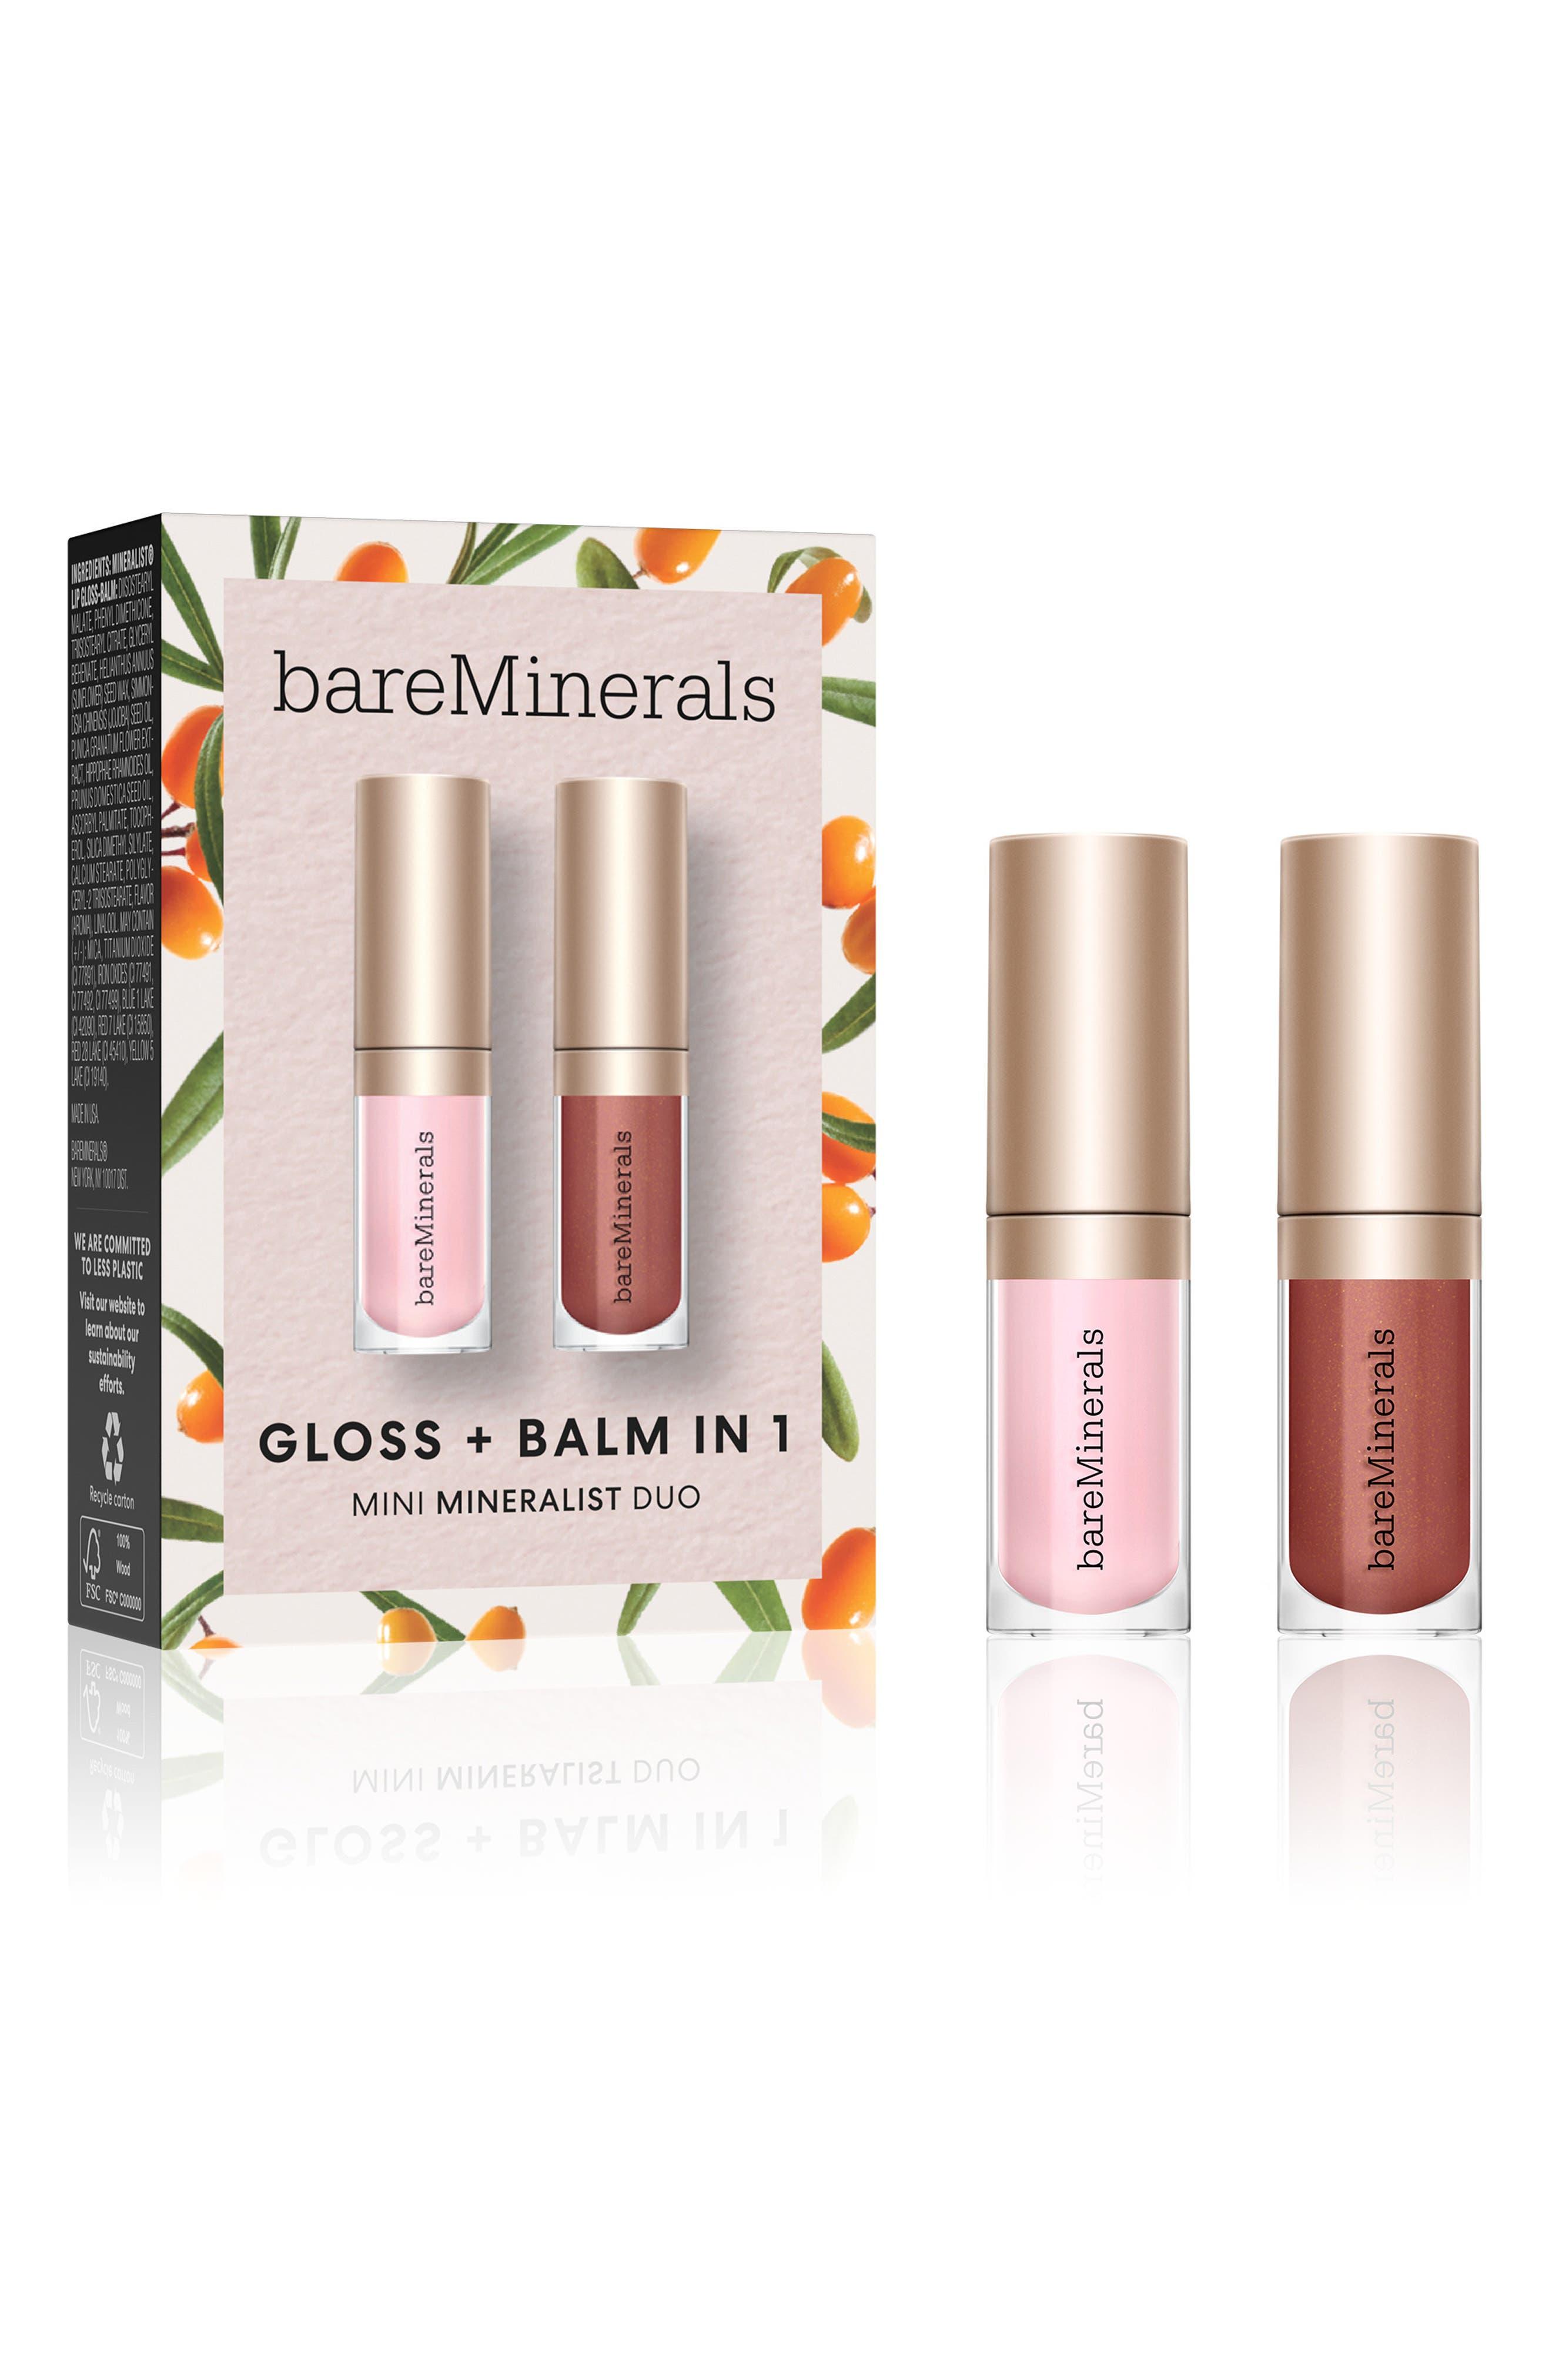 Bareminerals Mini Mineralist Gloss + Balm Duo